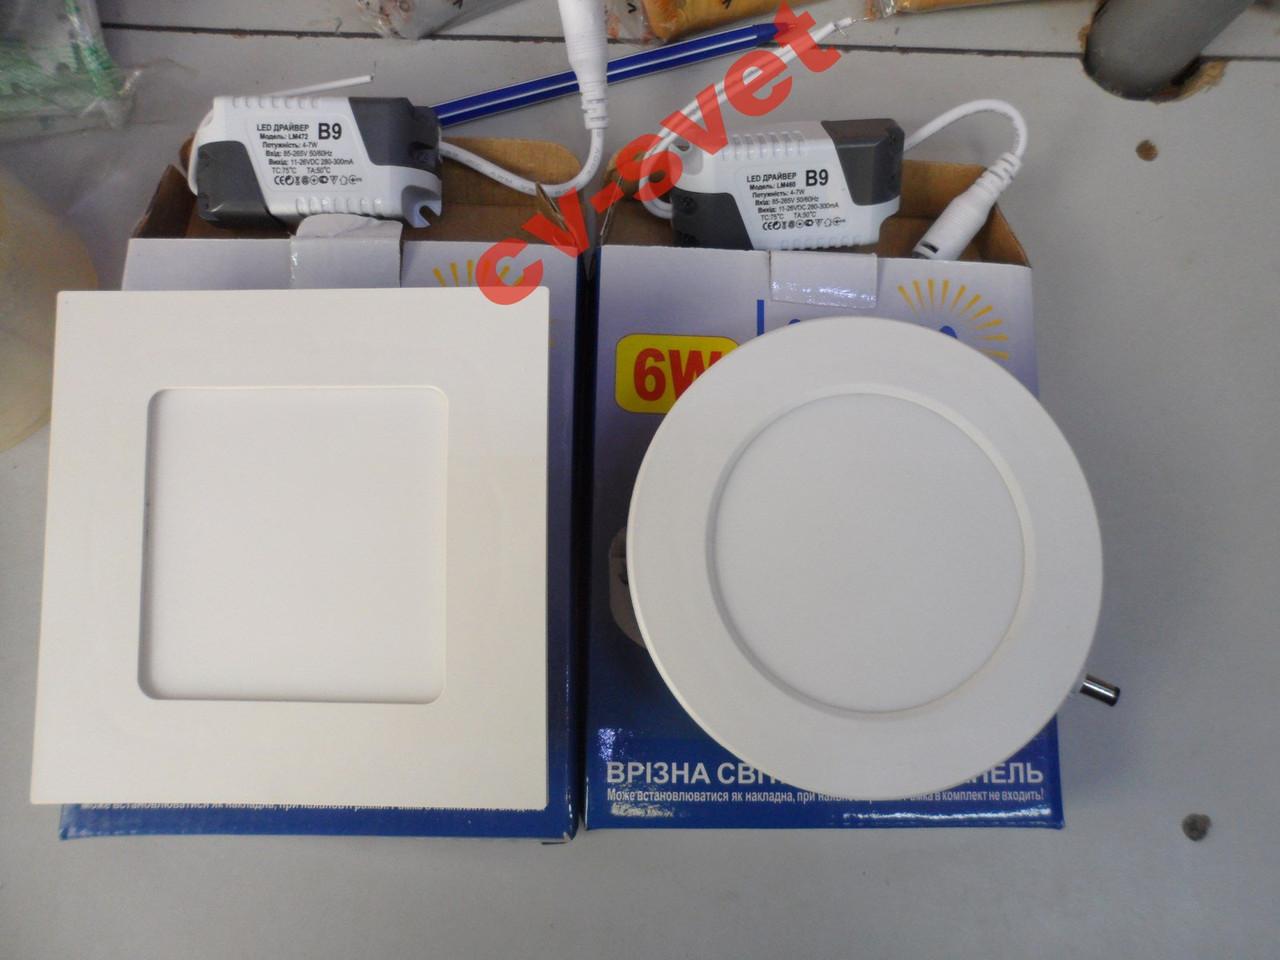 Светодиодная LED панель 6W ABS 450LM LM460 круг, фото 1